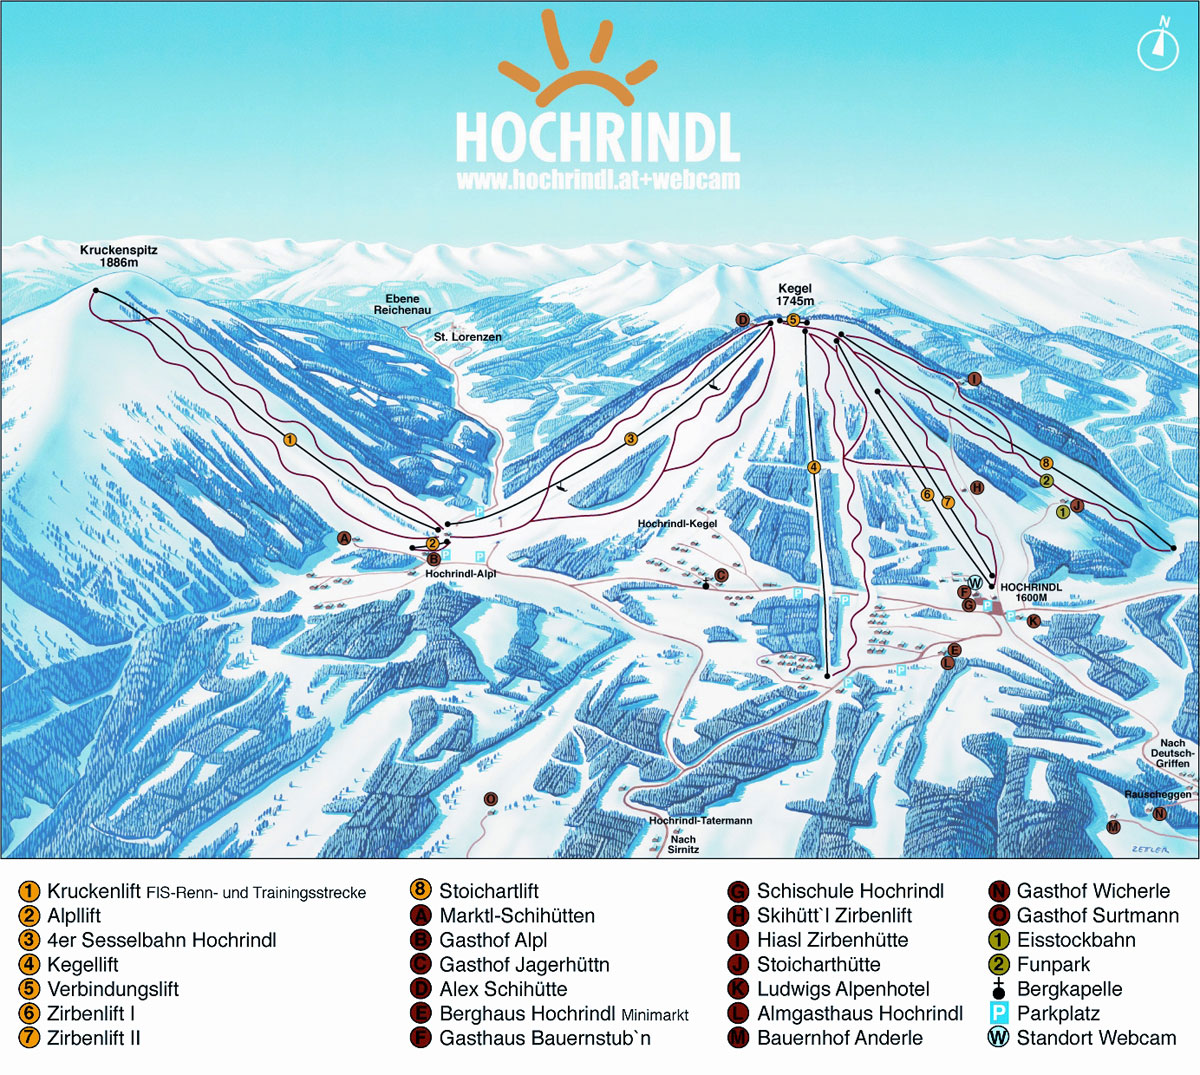 Hochrindl Piste / Trail Map